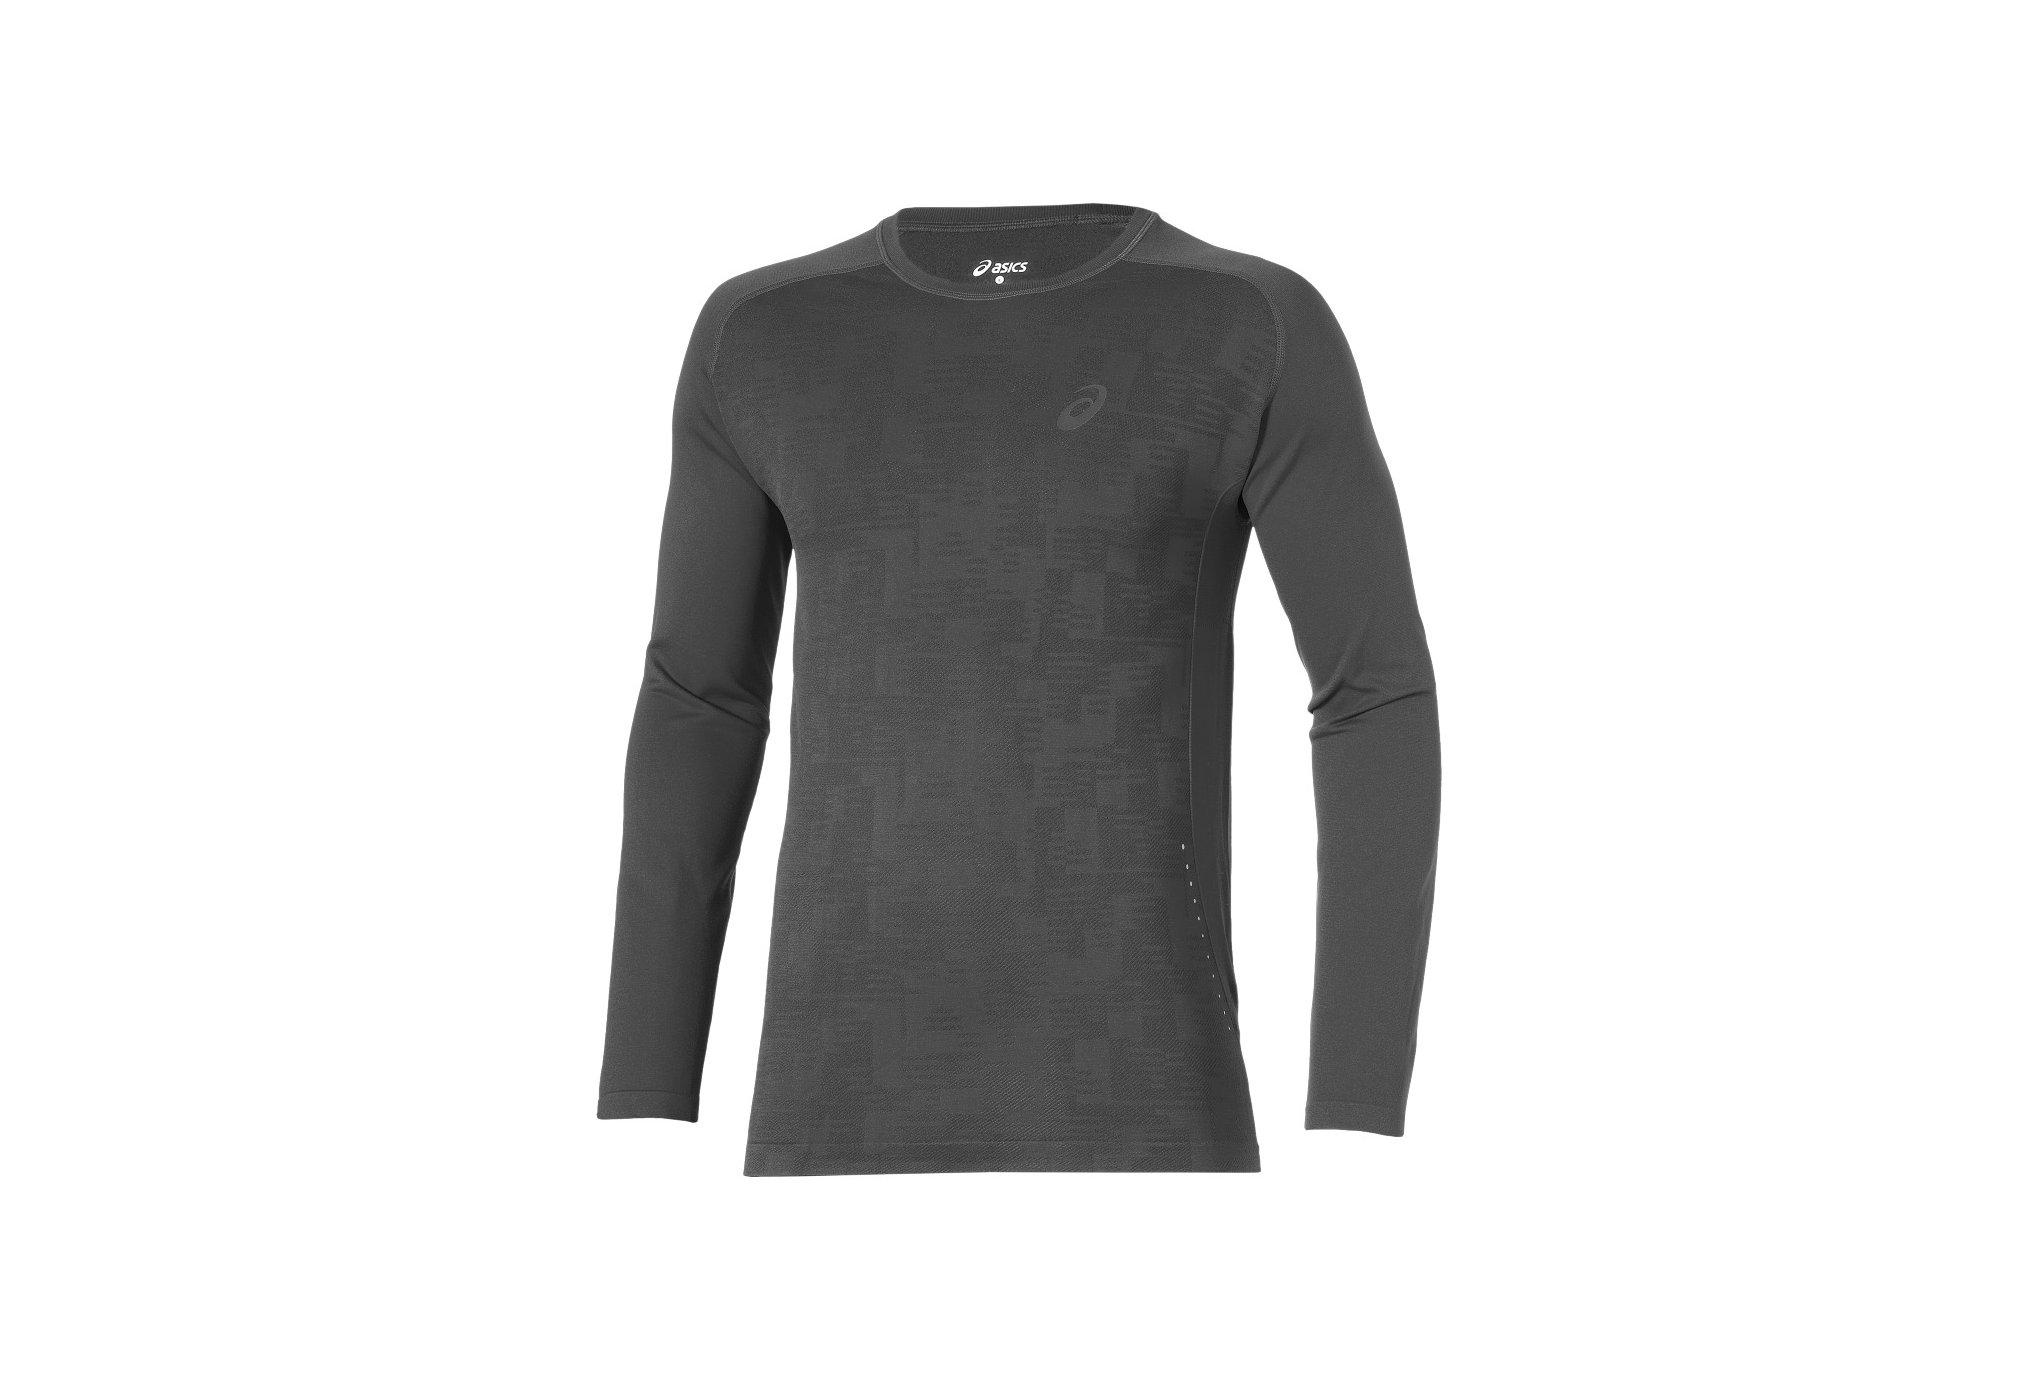 Asics Tee-Shirt Seamless Top M Diététique Vêtements homme